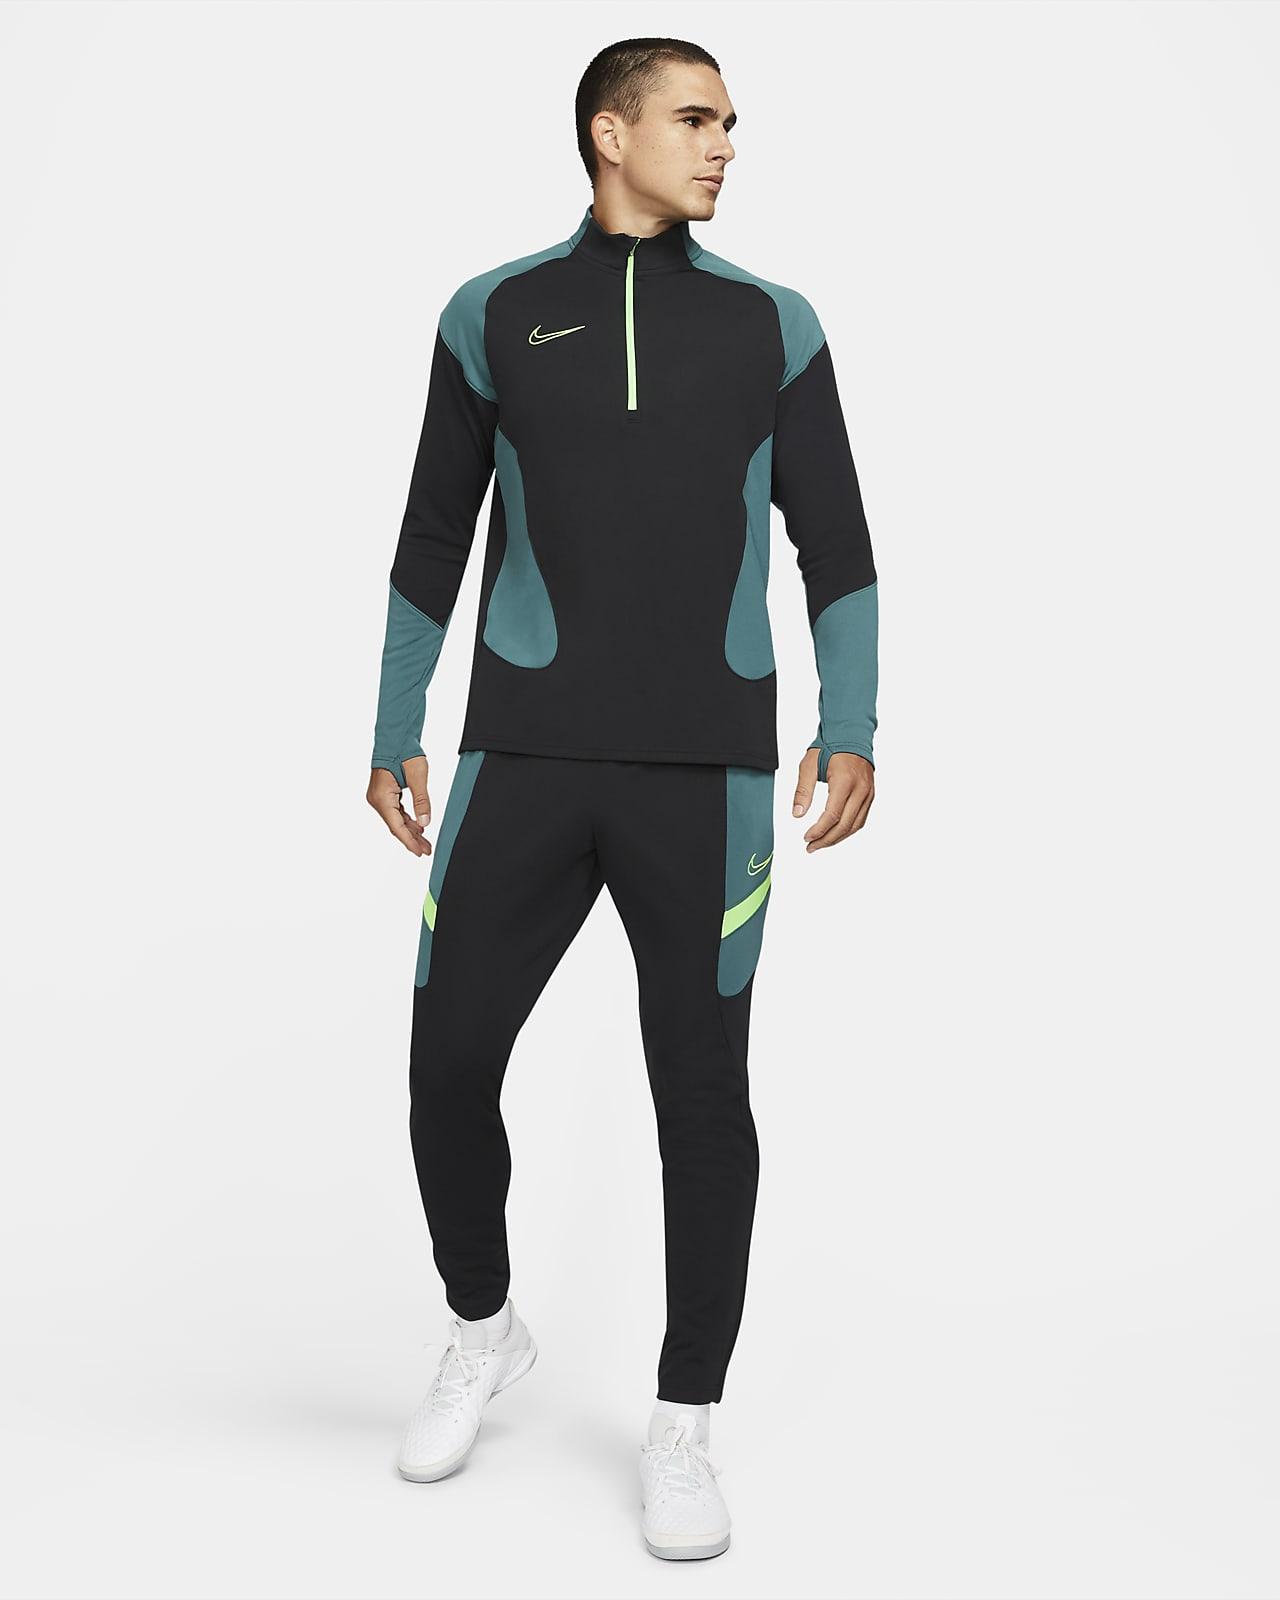 Nike Dri-FIT Academy kötött férfi futballtréningruha